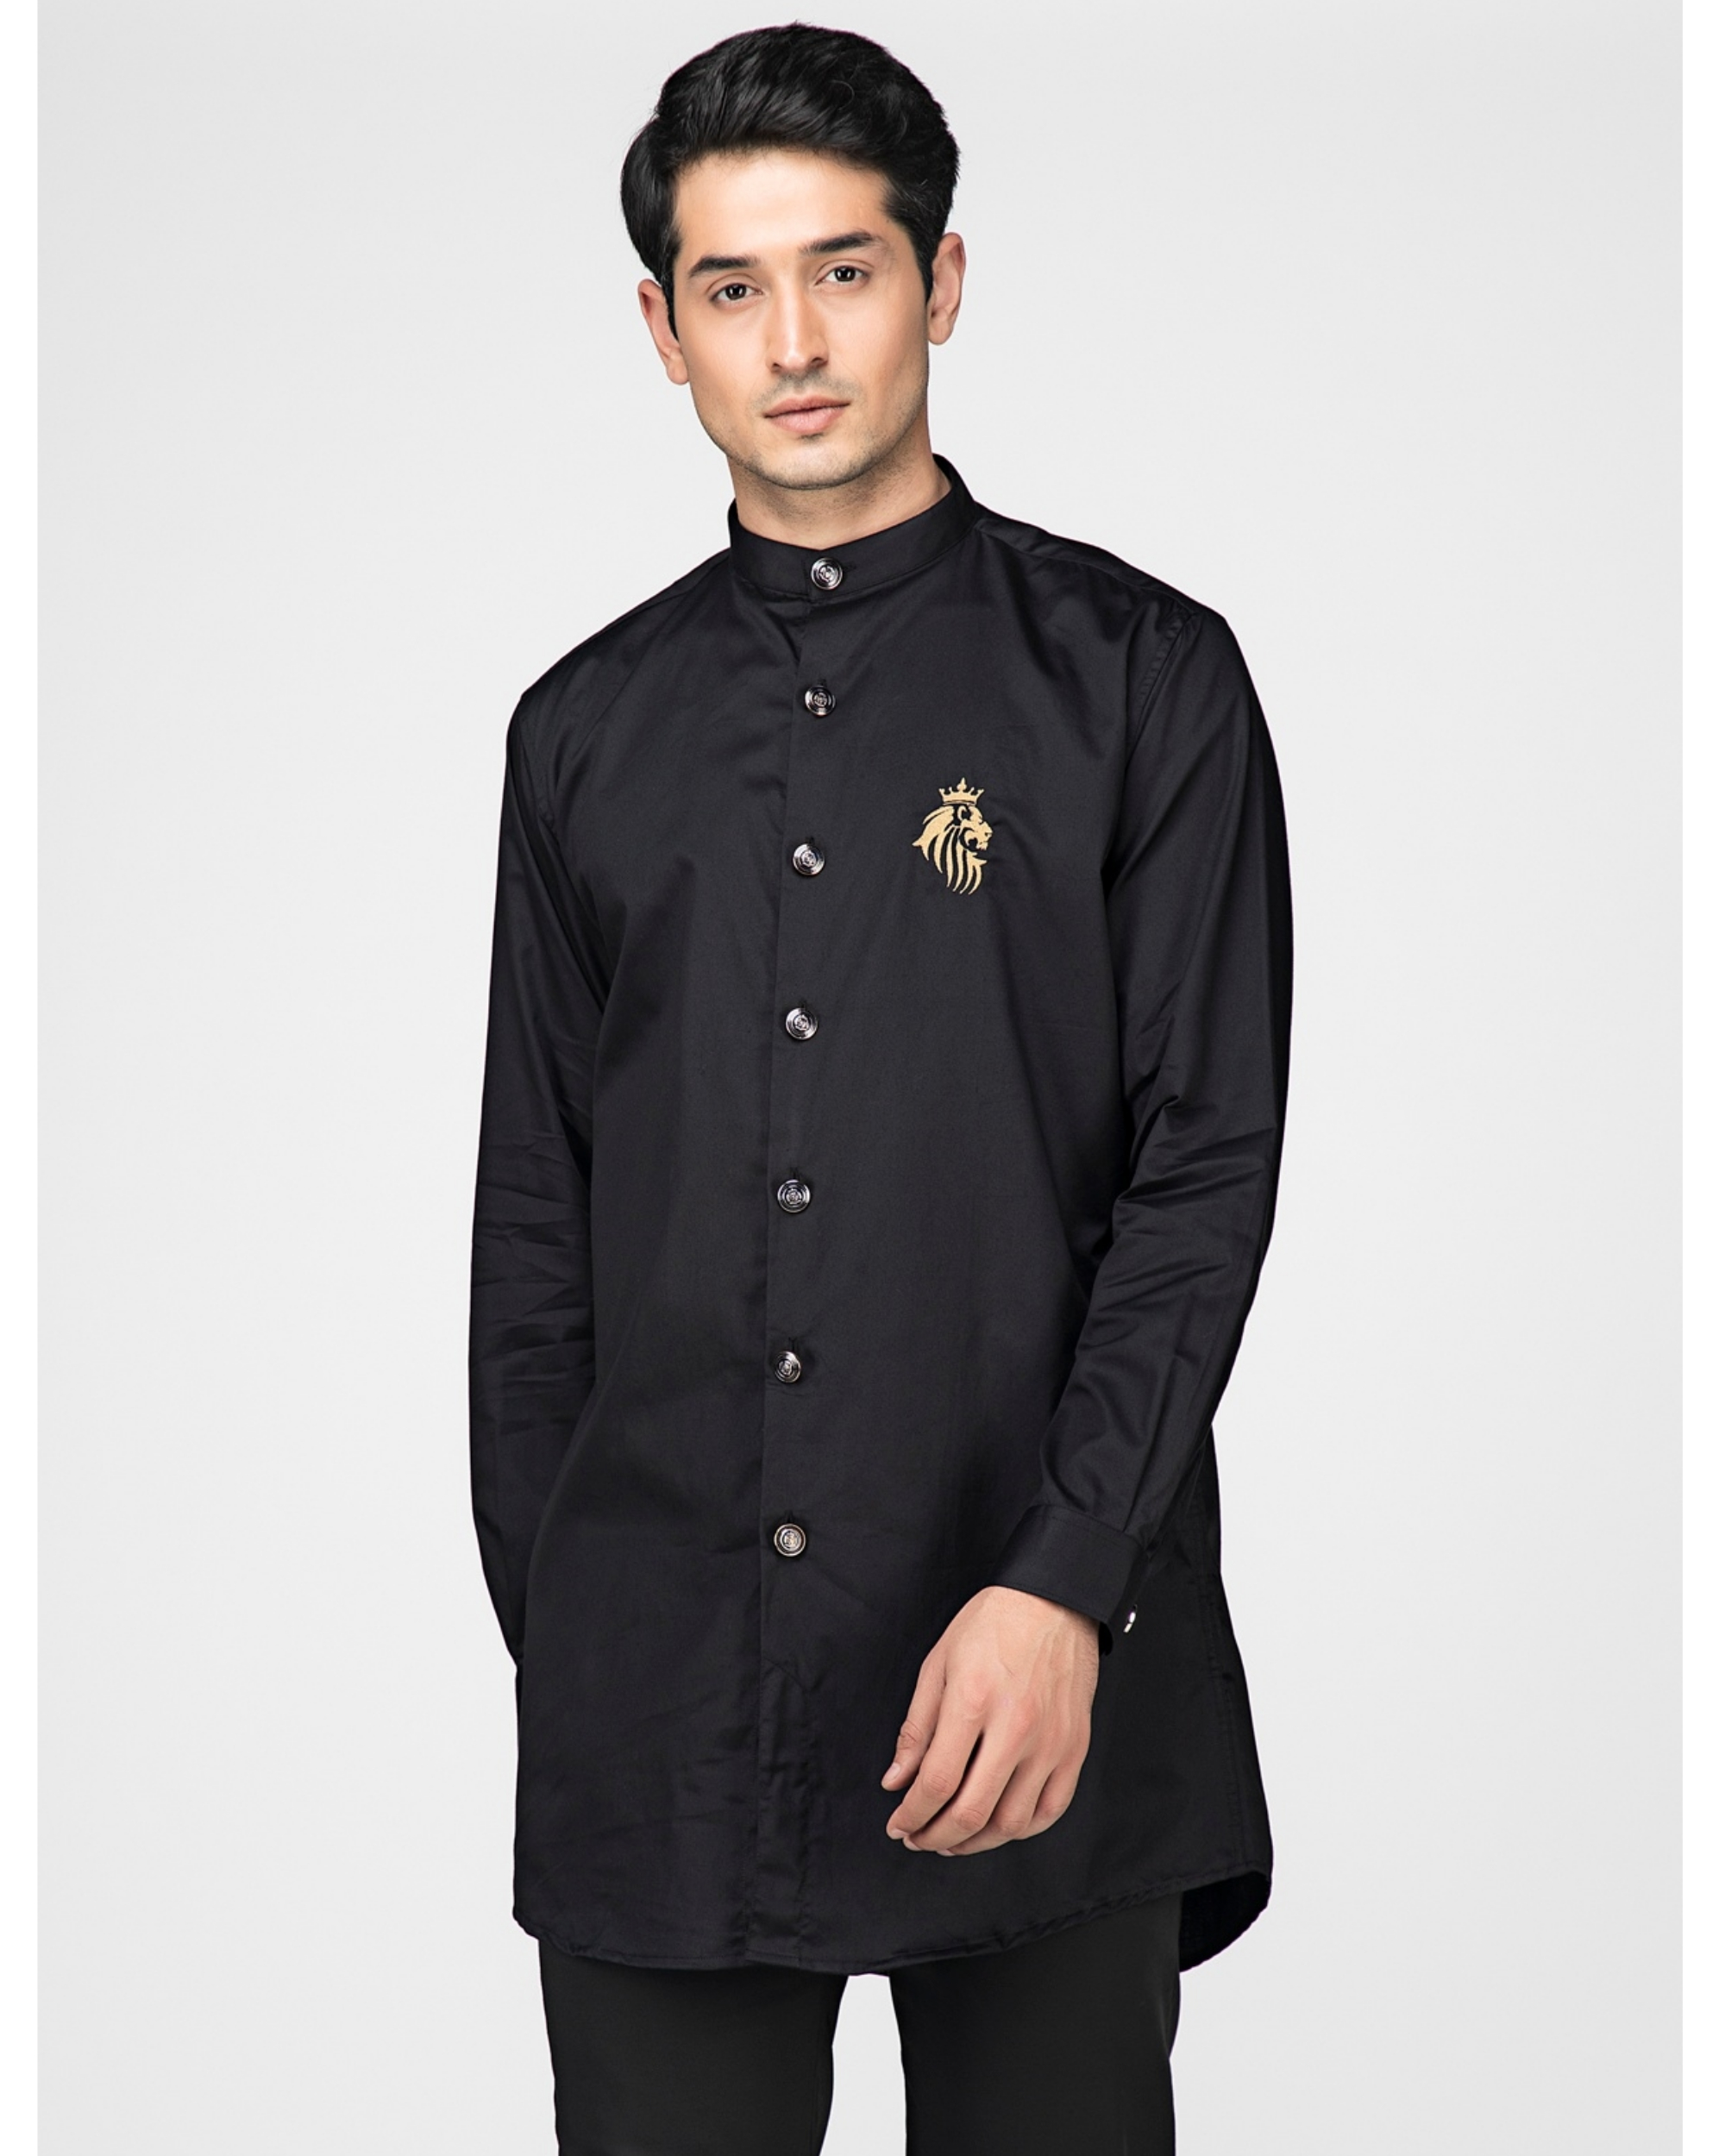 Black cotton satin leo kurta